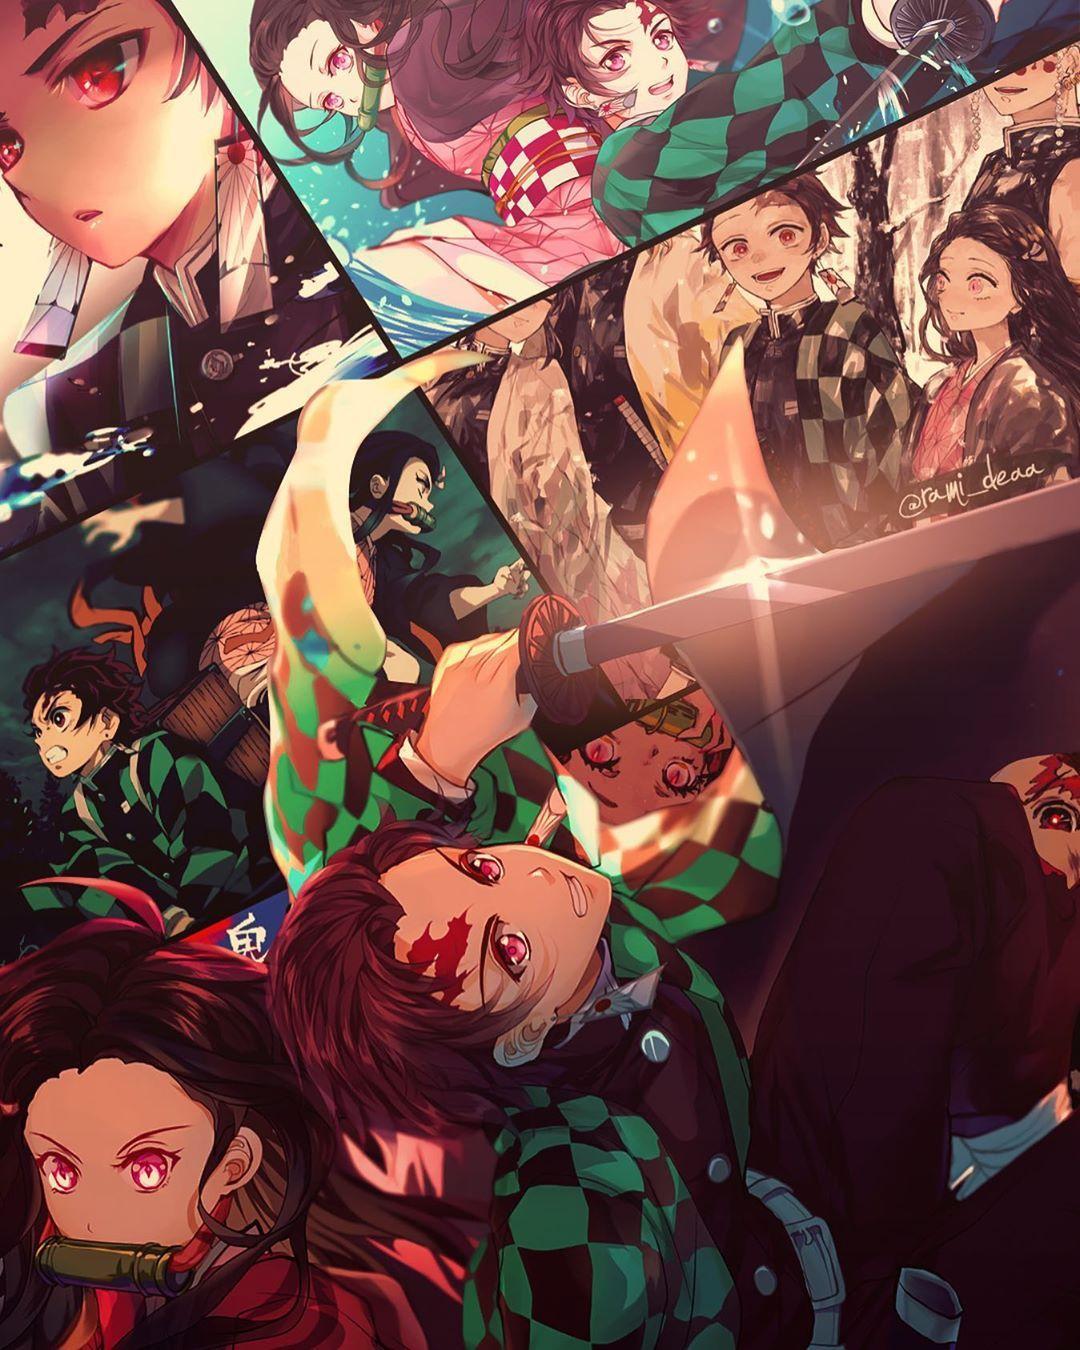 R Jay En Instagram Demon Slayer Demonslayer Kimetsunoyaiba Nezuko Tankiro Anime Art Design Wallpaper Japan Tokyo In 2020 Anime Demon Anime Anime Wallpaper